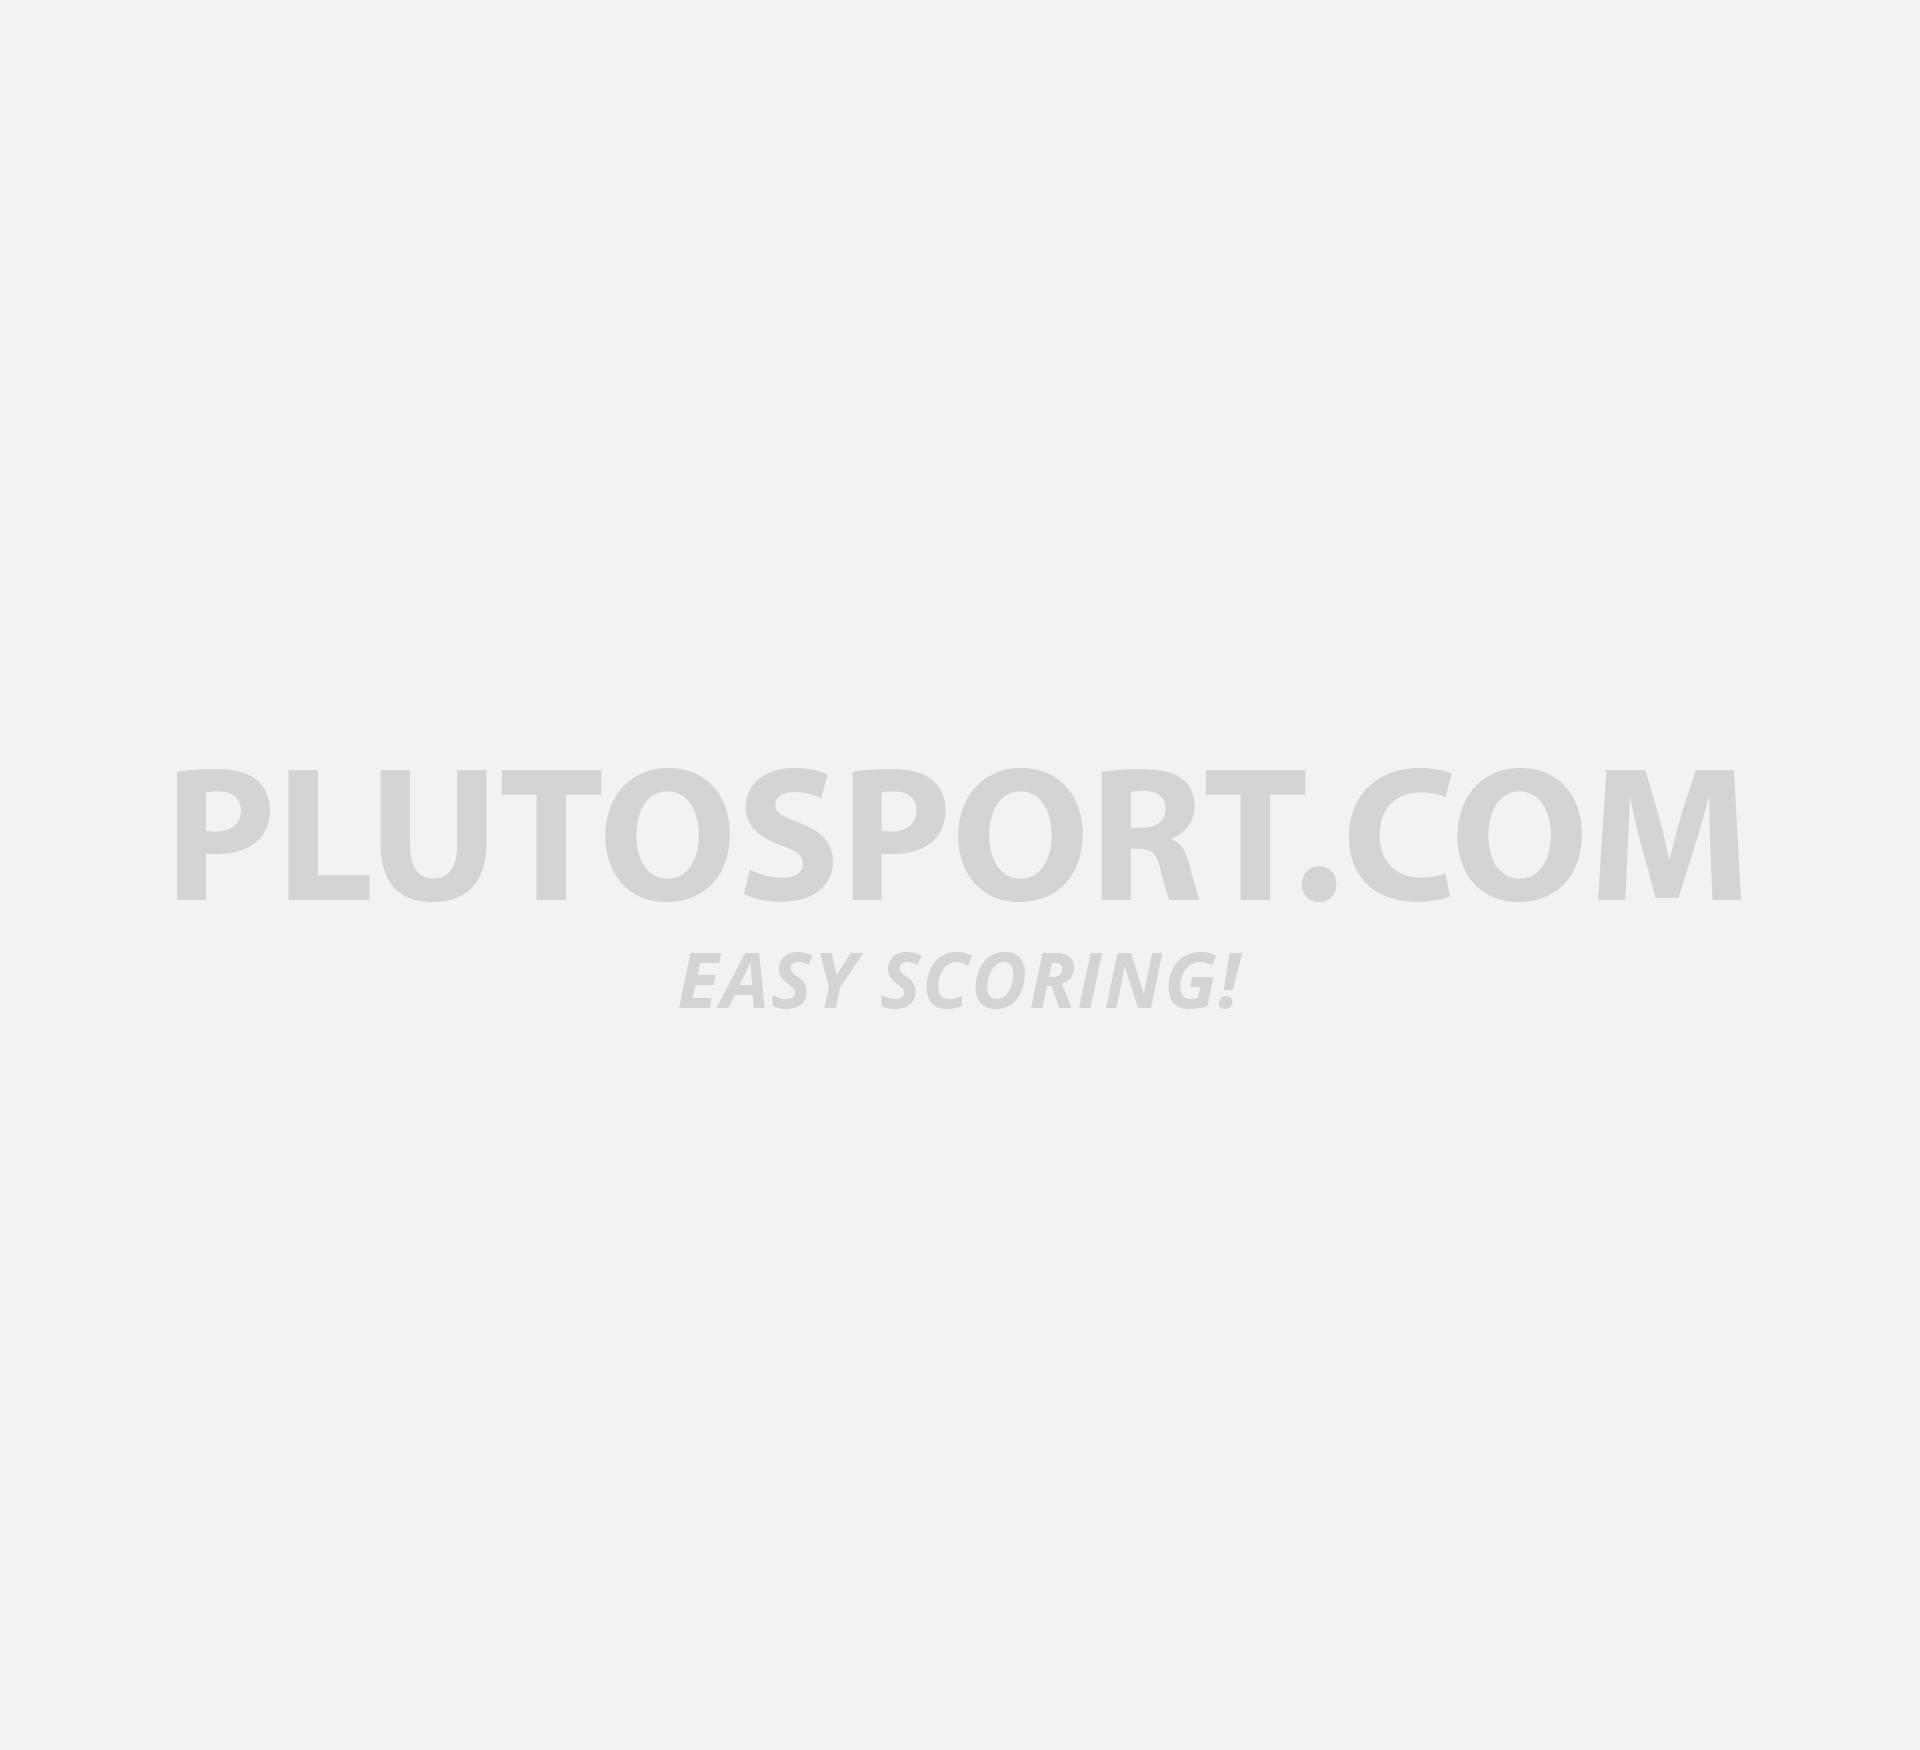 e85a74a38f0 Nike Team Training Shoe Bag - Shoe bags - Bags - Football - Sports    Plutosport